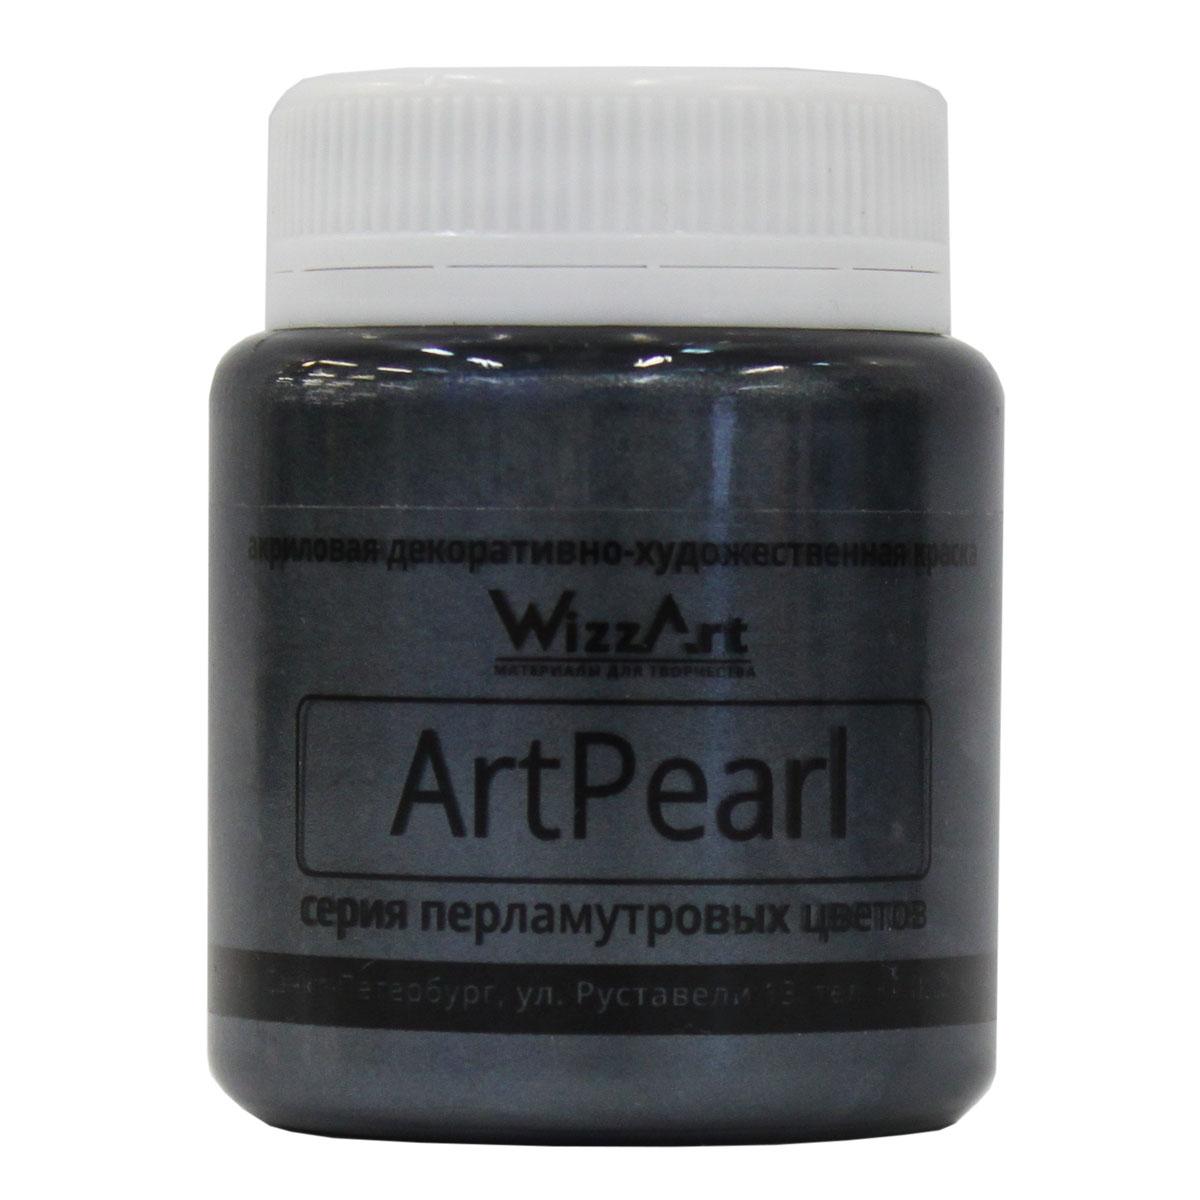 Краска акриловая Wizzart ArtPearl, цвет: графит, 80 мл501027